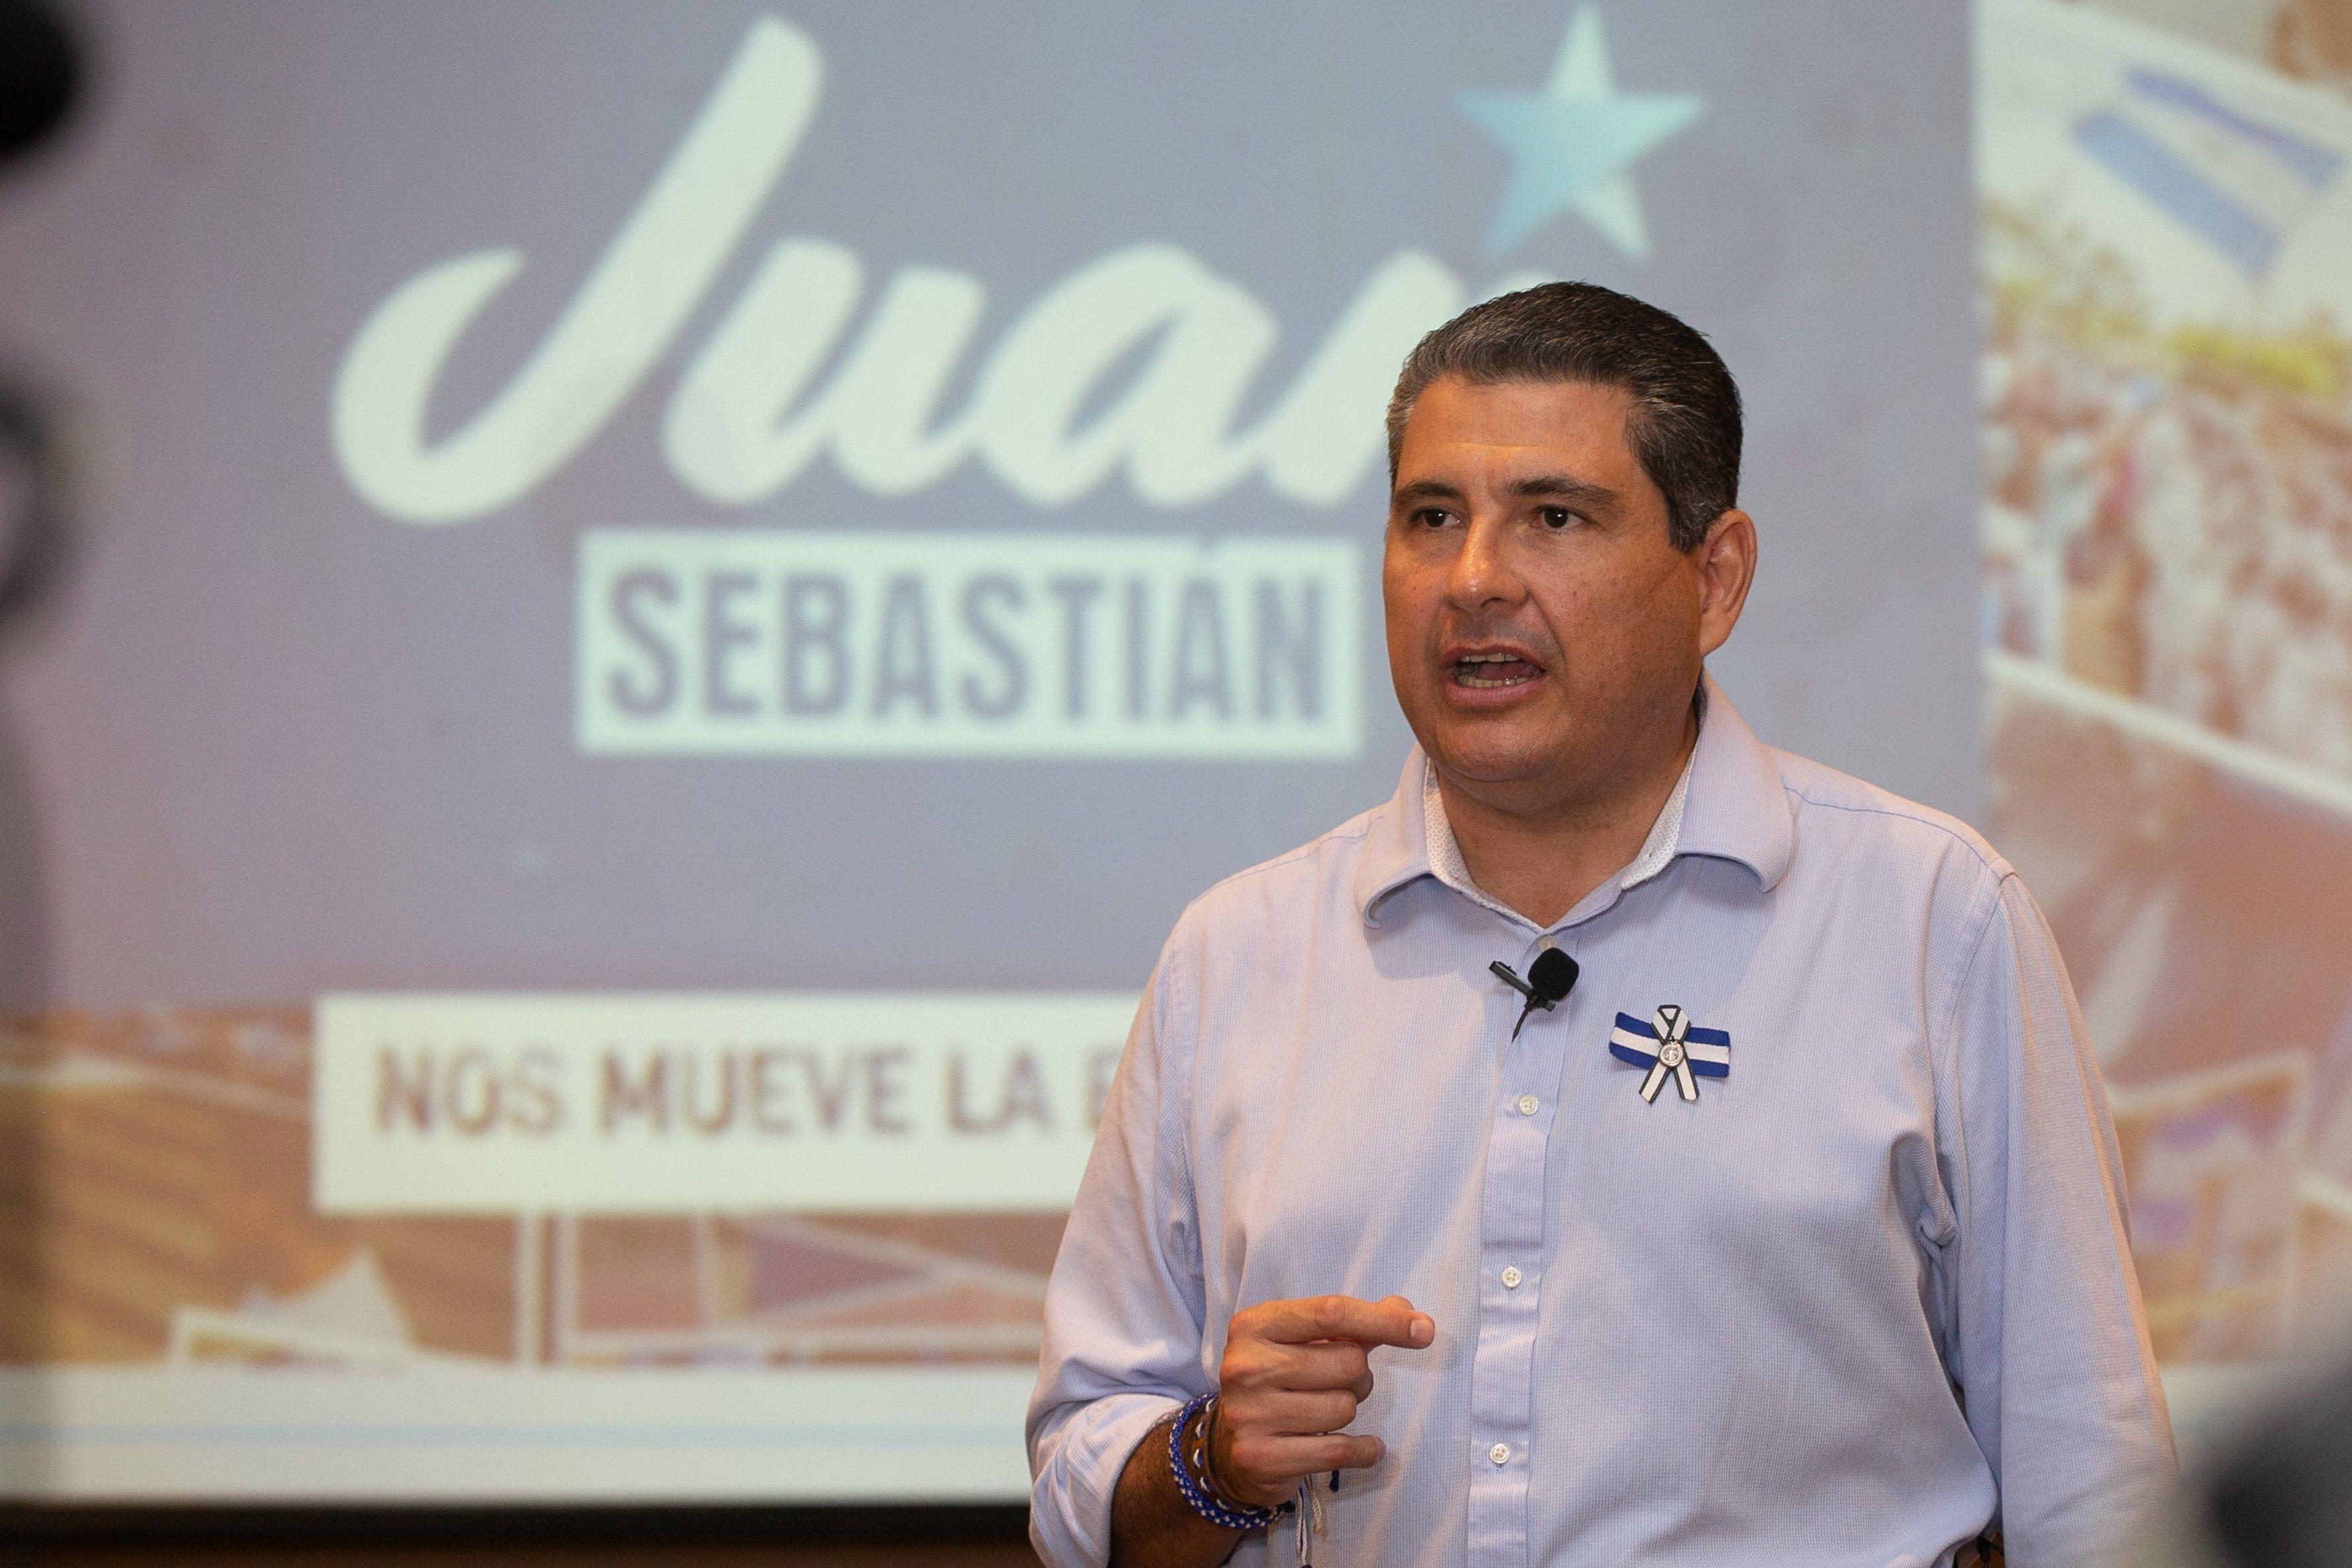 Juan Sebastián Chamorro (EFE/Jorge Mejía Peralta/Equipo Juan Sebastián Chamorro)